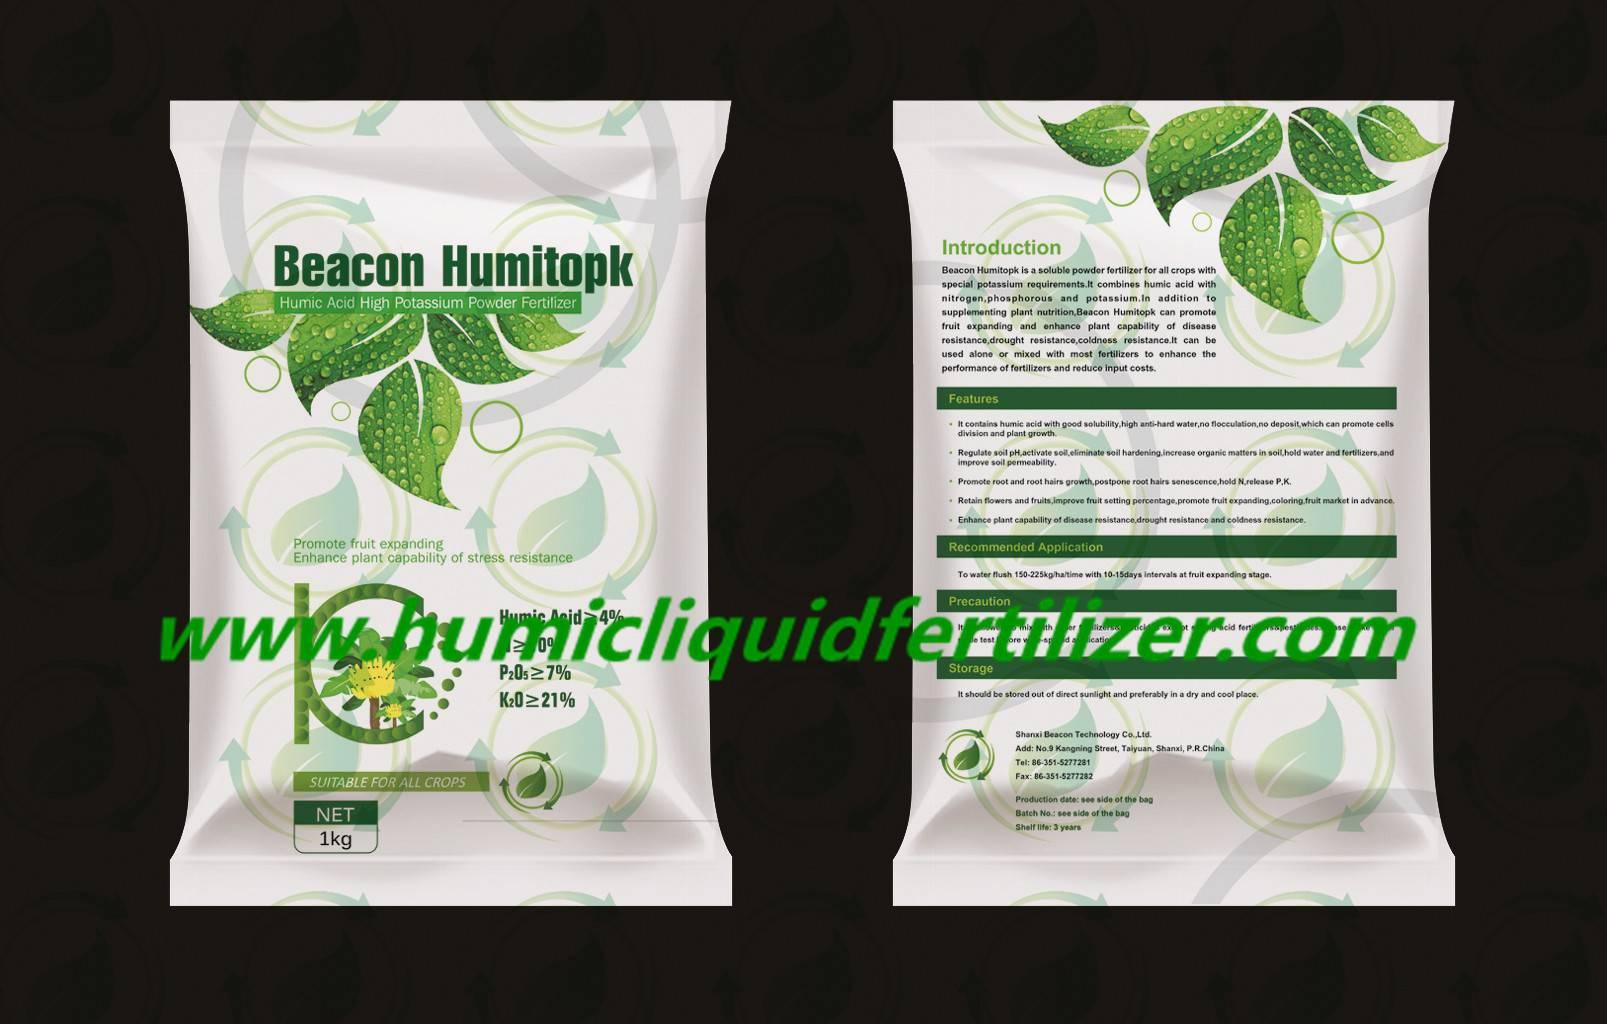 Beacon Humitopk Humic Acid High Potassium Powder Fertilizer